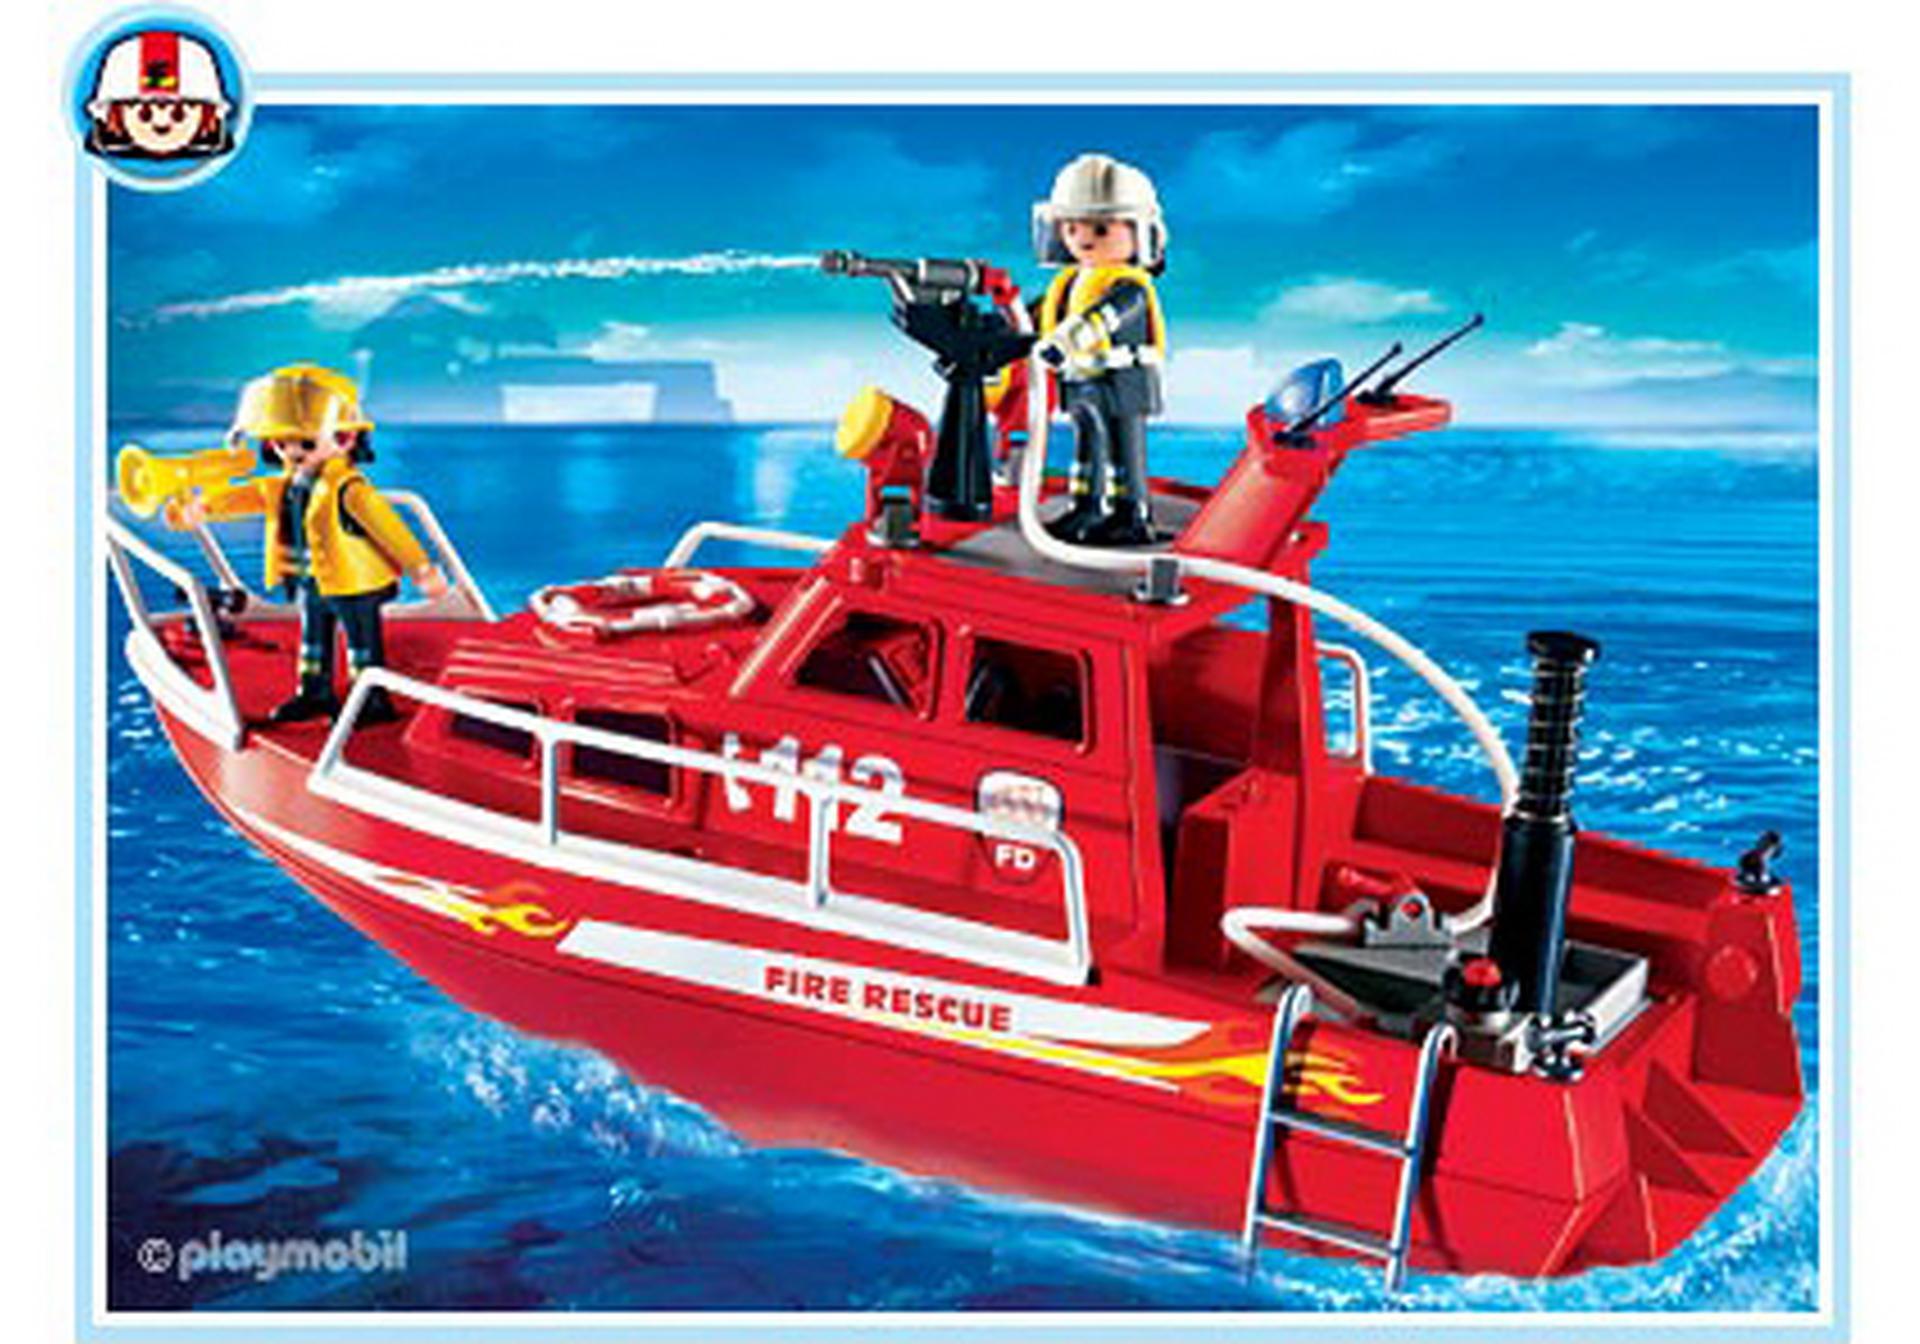 pompiers sauveteurs bateau 3128 b playmobil france. Black Bedroom Furniture Sets. Home Design Ideas